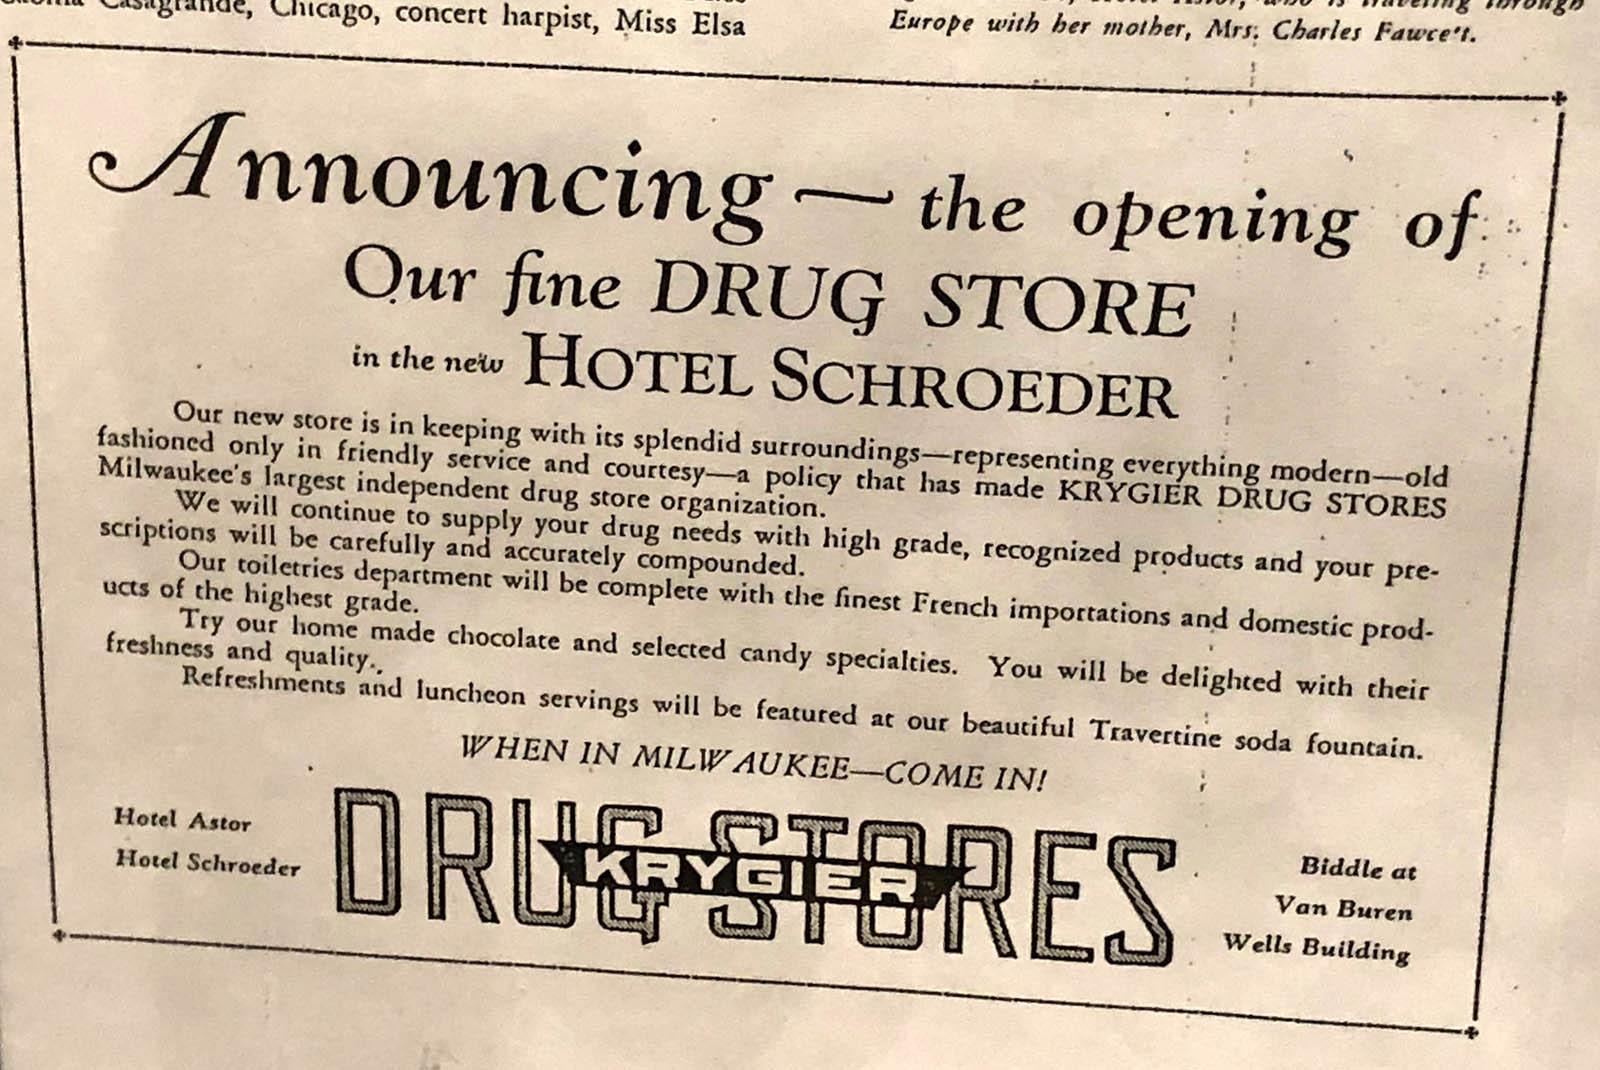 Hotel Astor drug store.